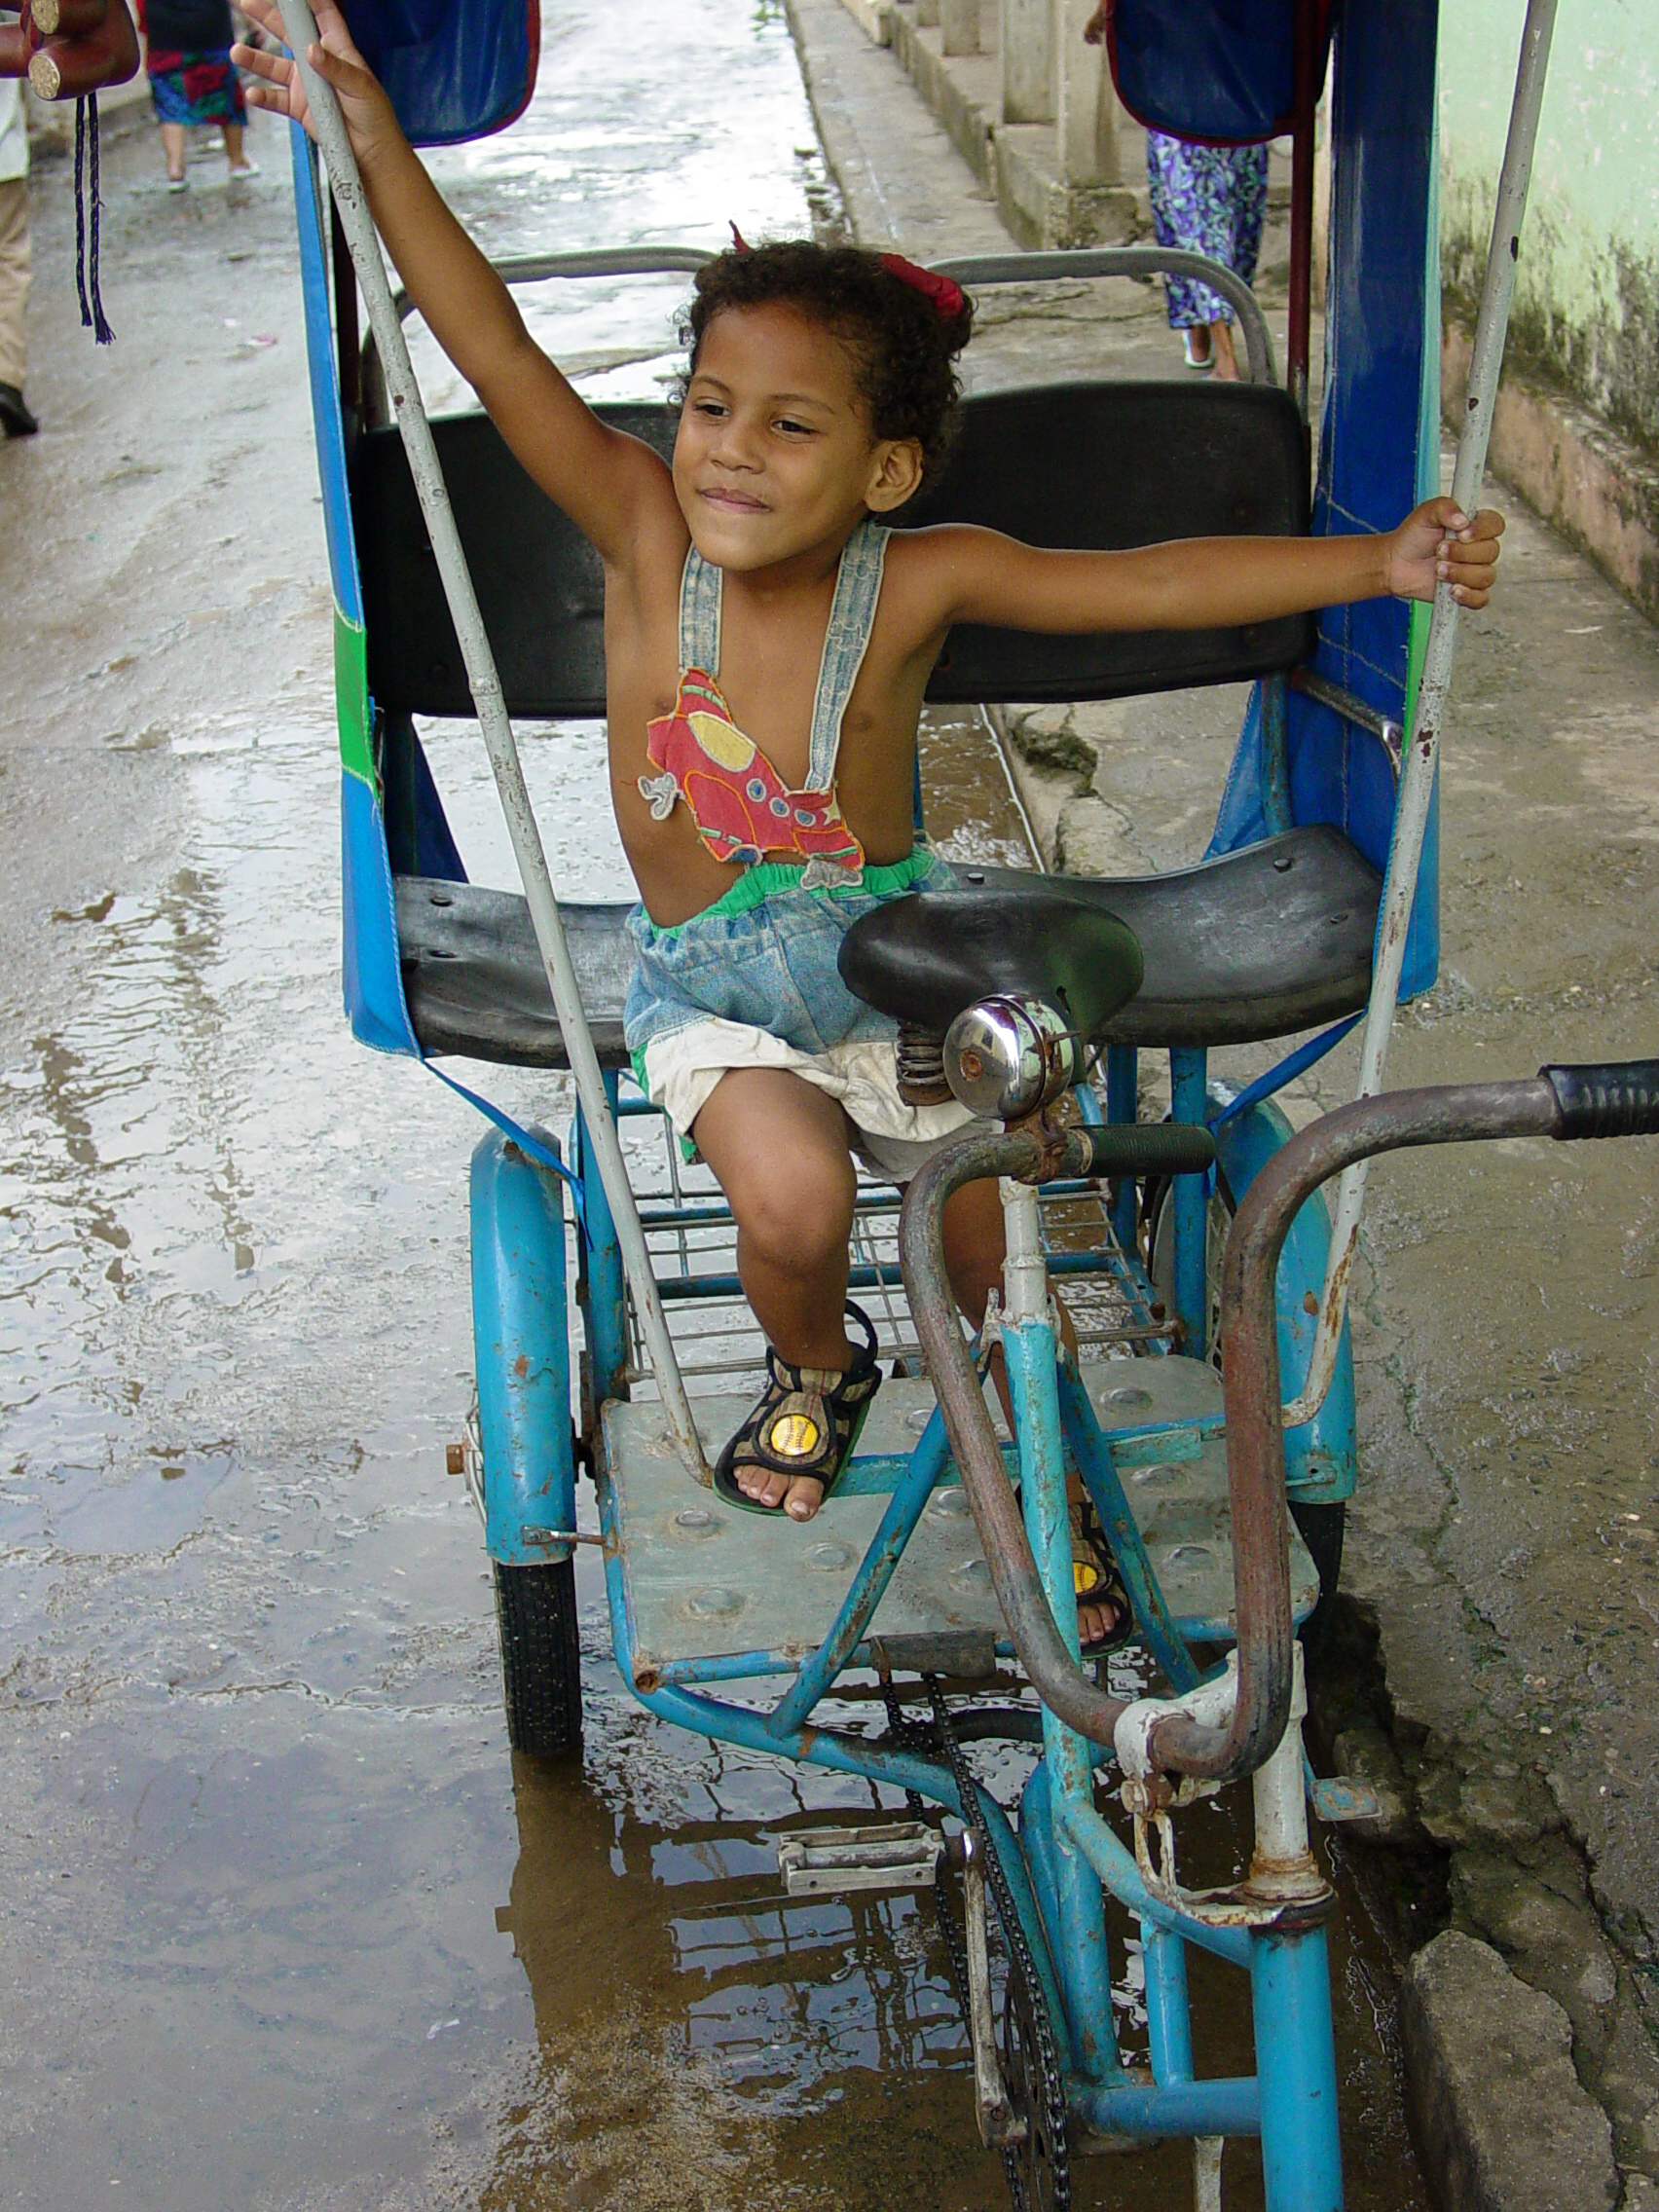 Description Girl Plays in a Pedicab - Baracoa - Cuba.jpg